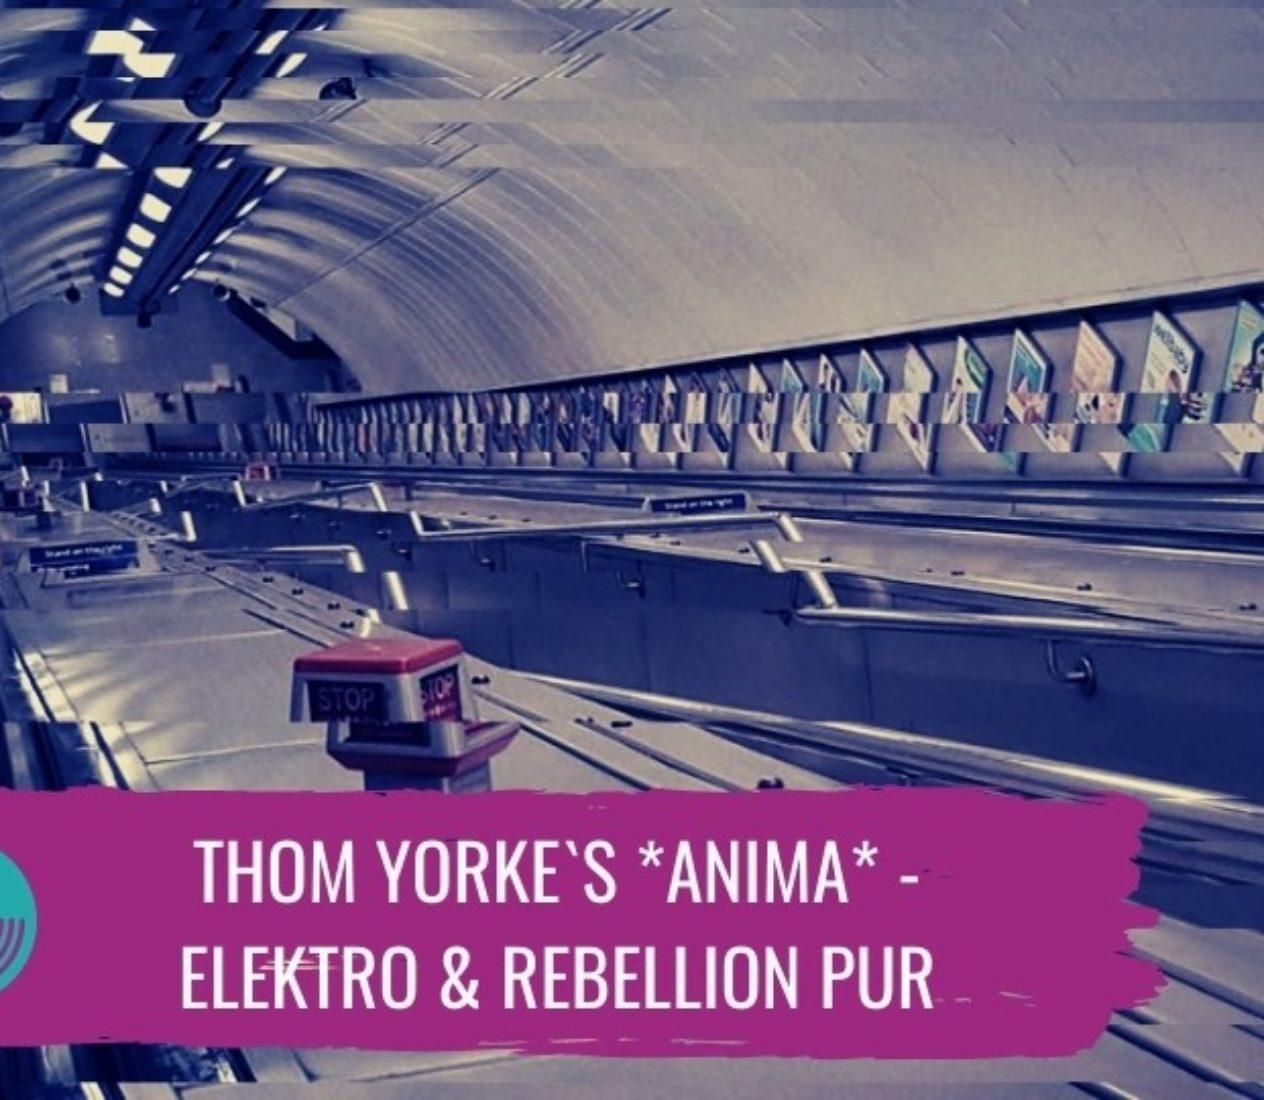 Thom  Yorke`s *Anima*: Elektro & Rebellion pur